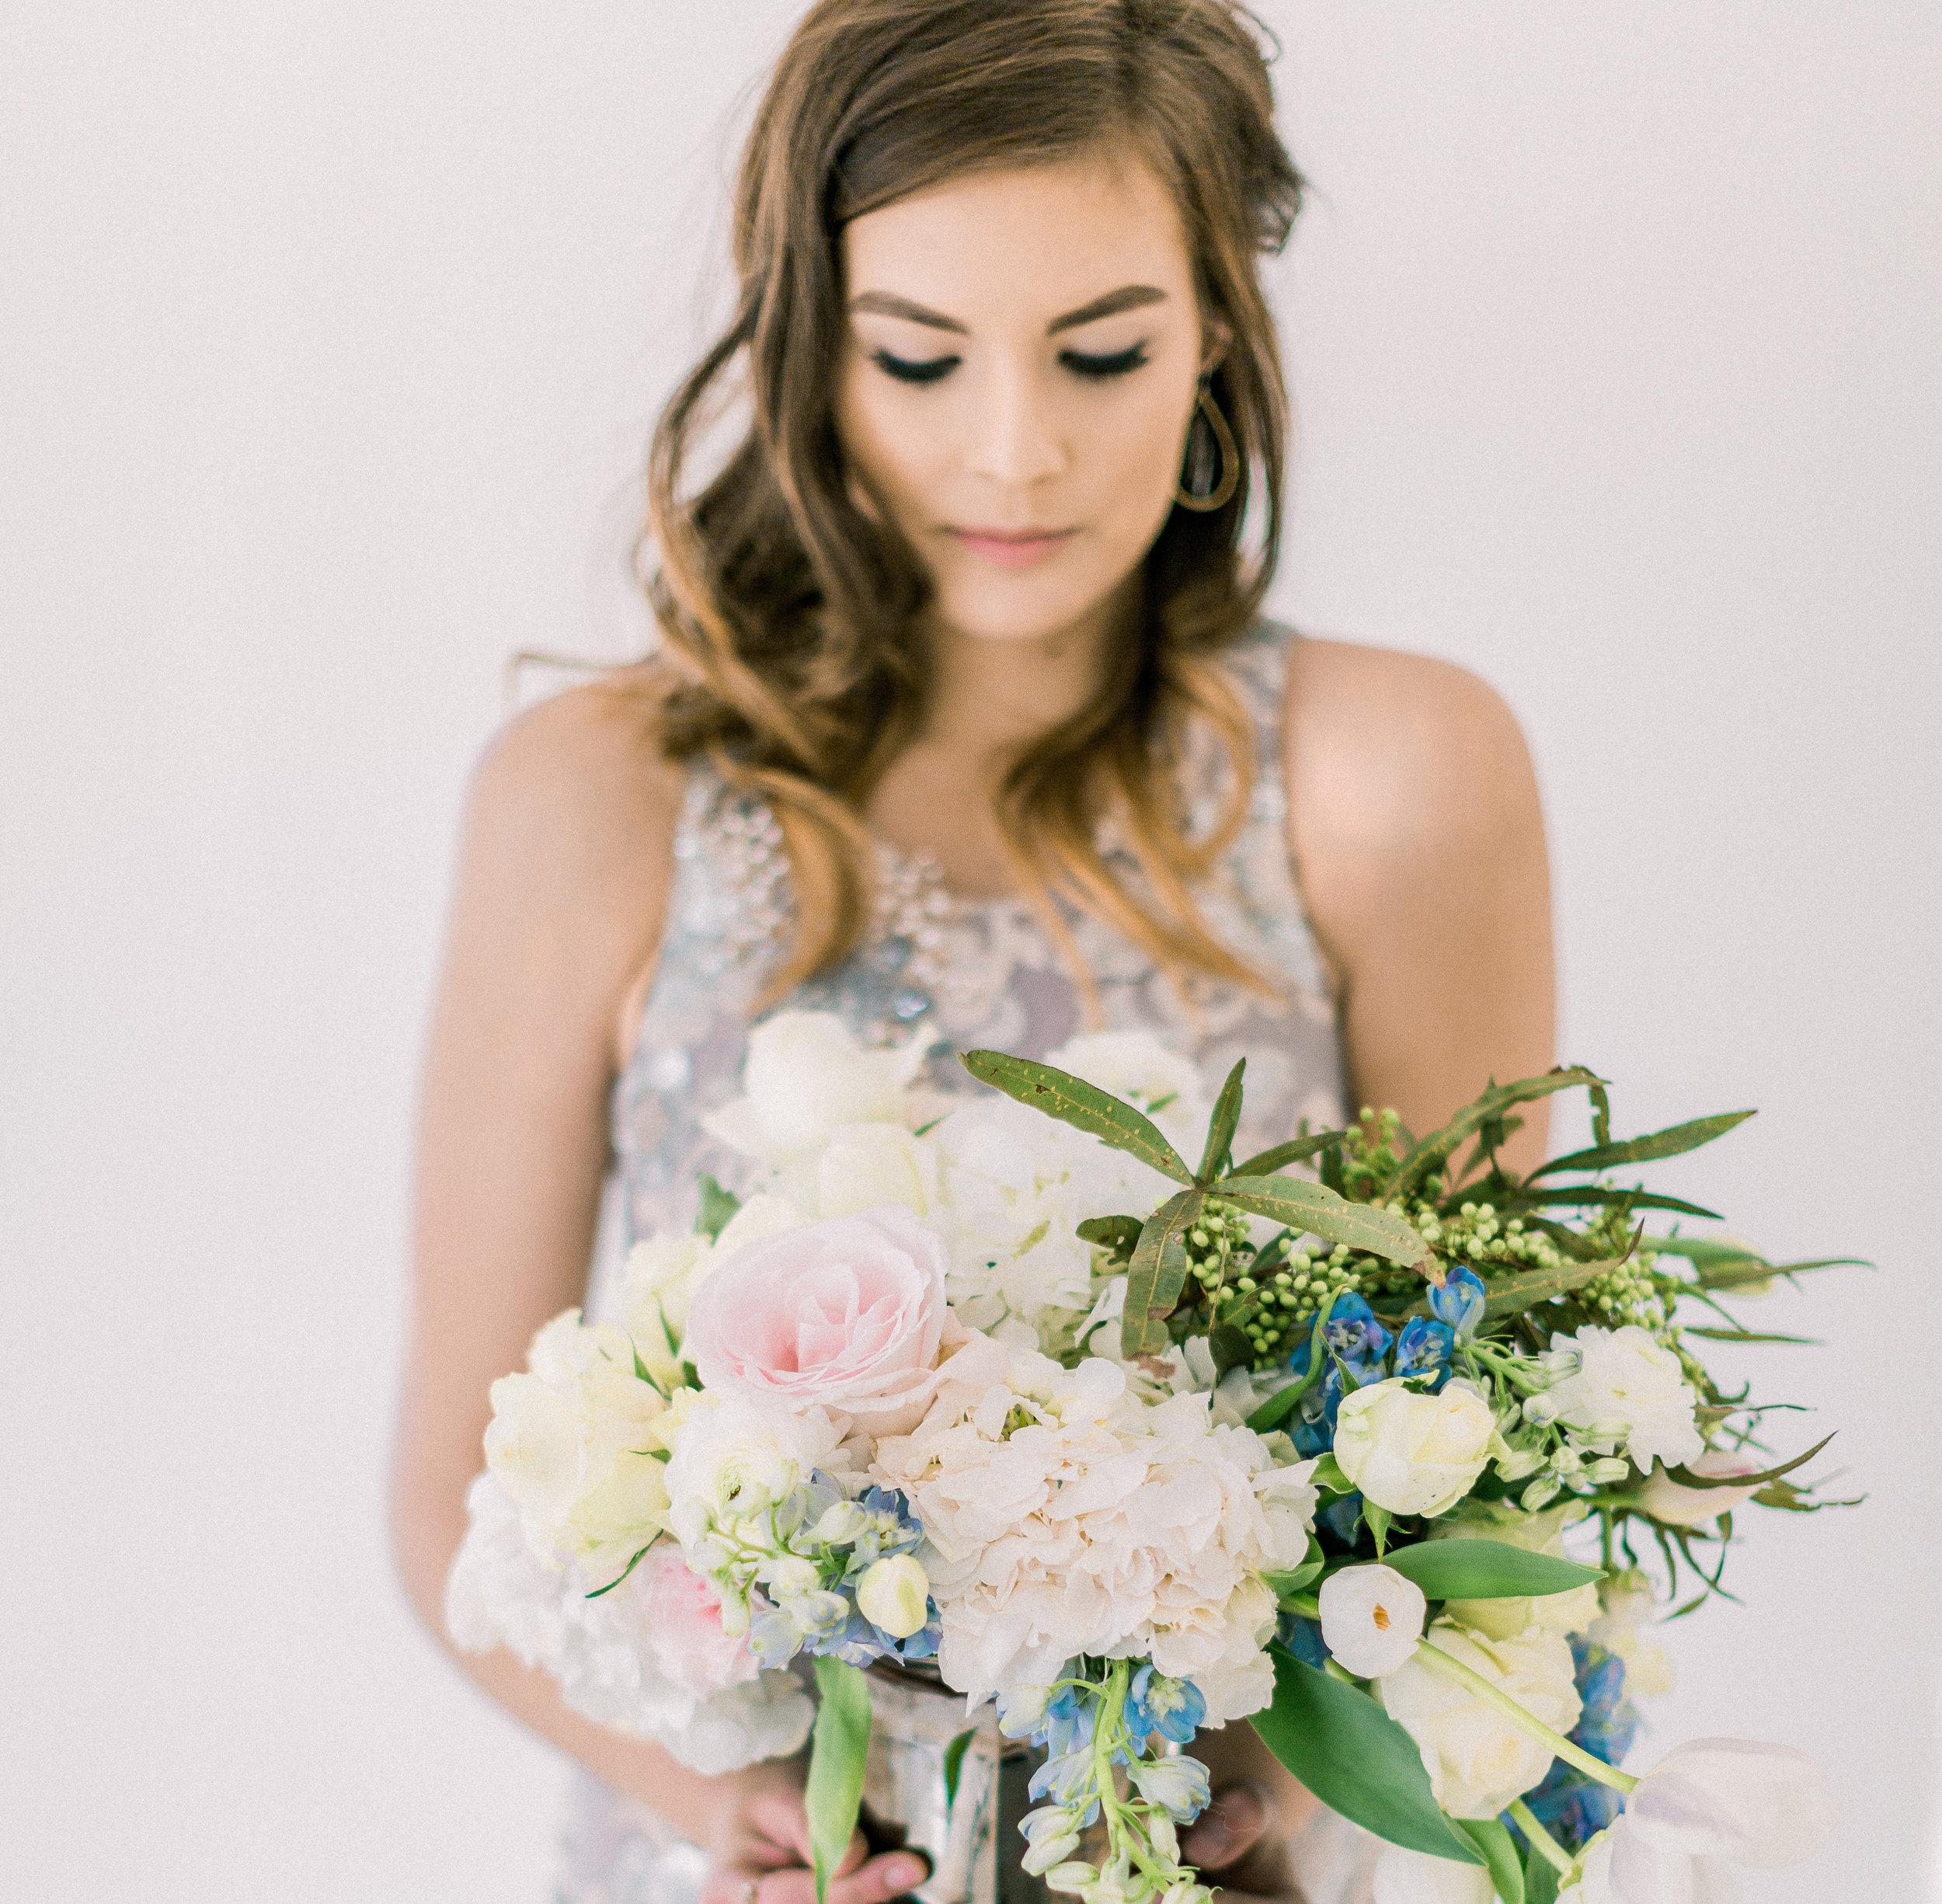 Hertford country hotel wedding photographer clareece smit